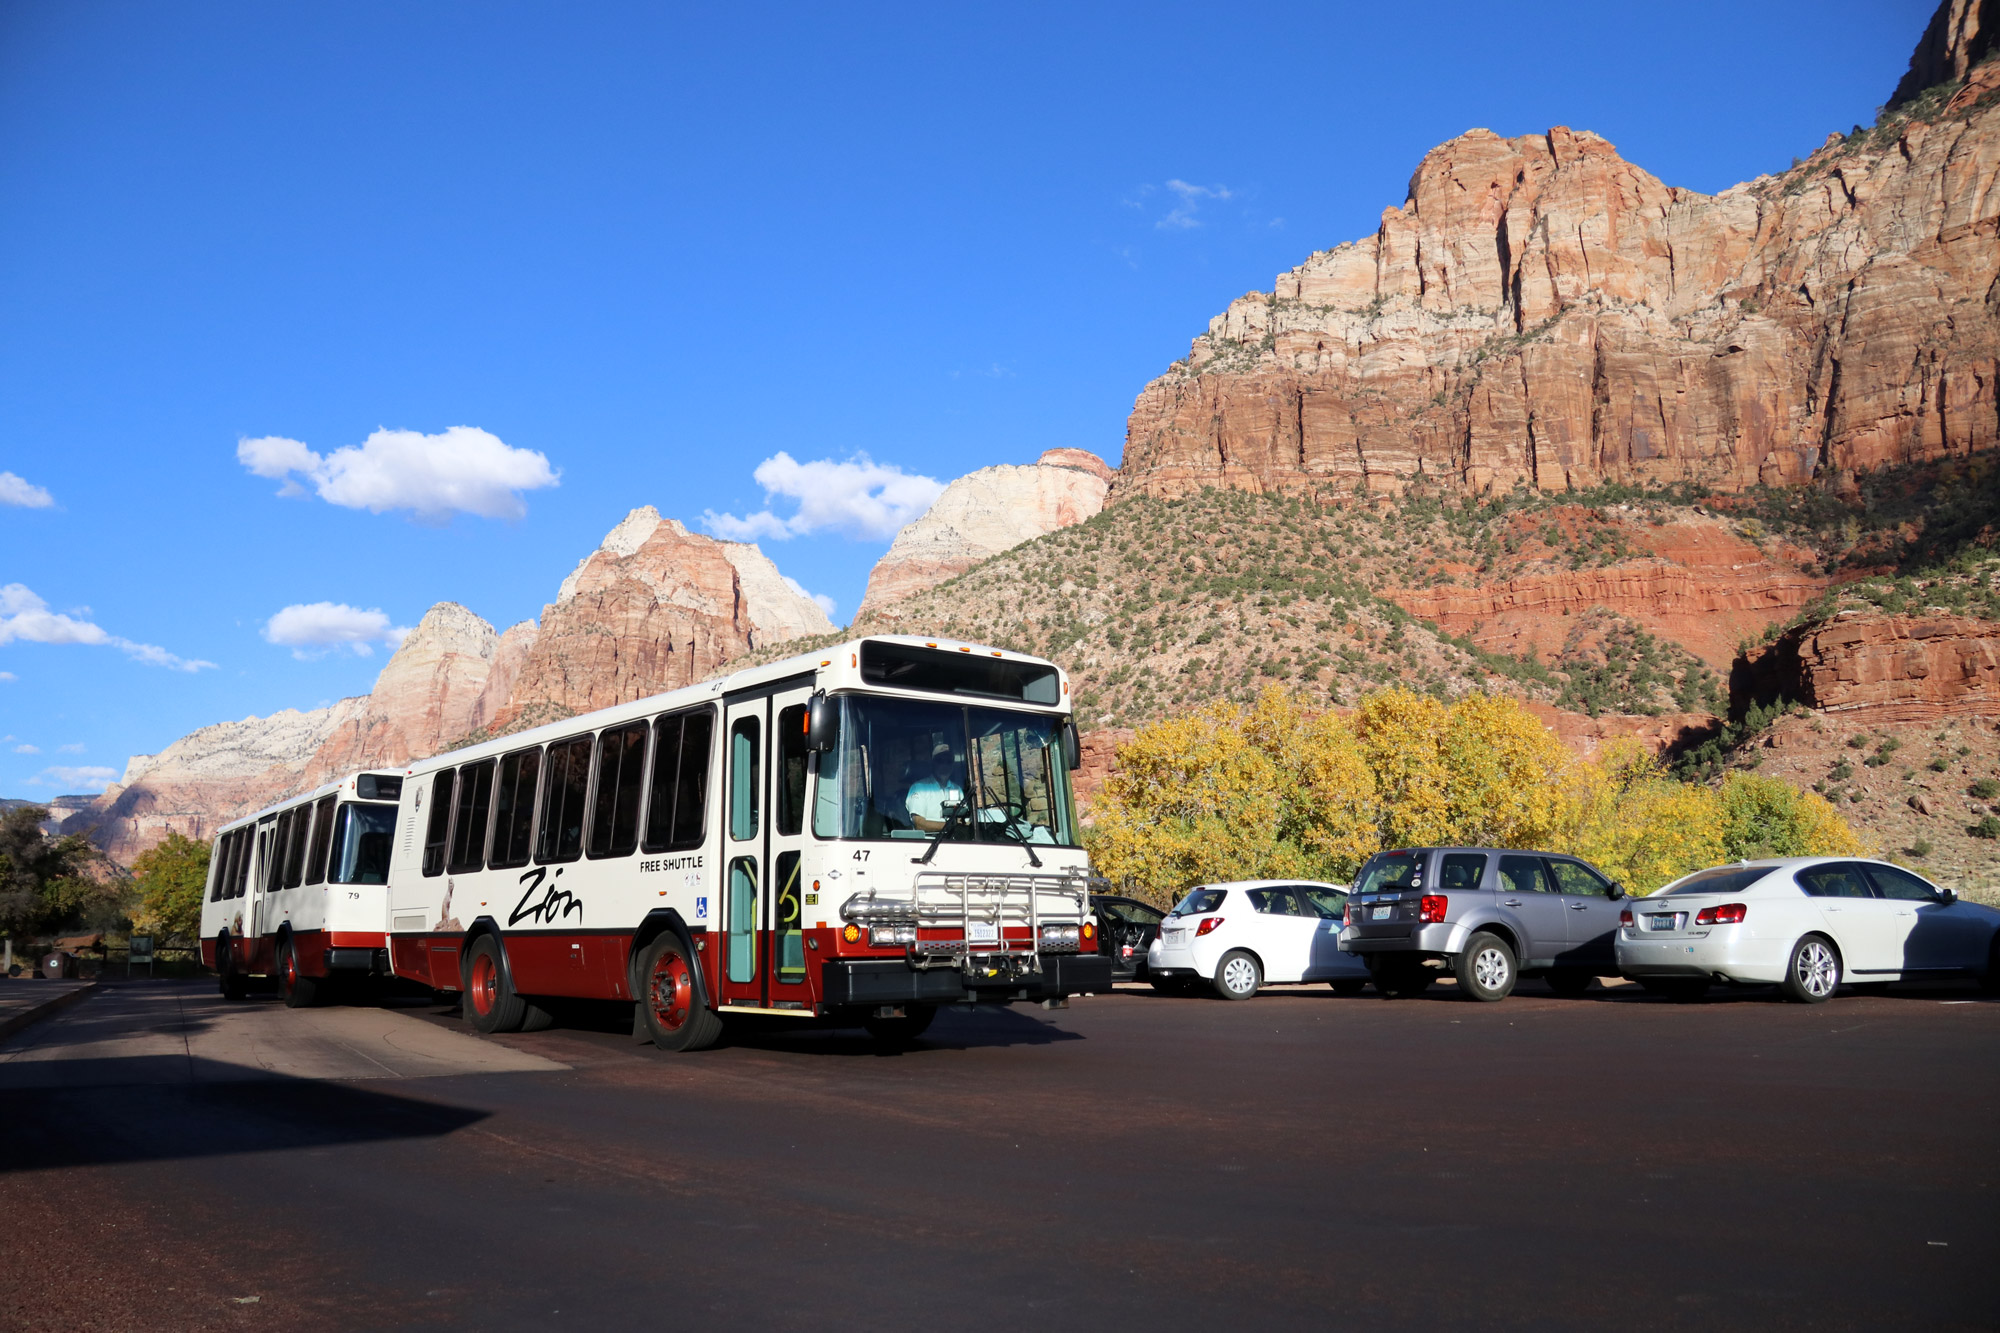 Amerika dag 15 - Zion National Park - Shuttlebus